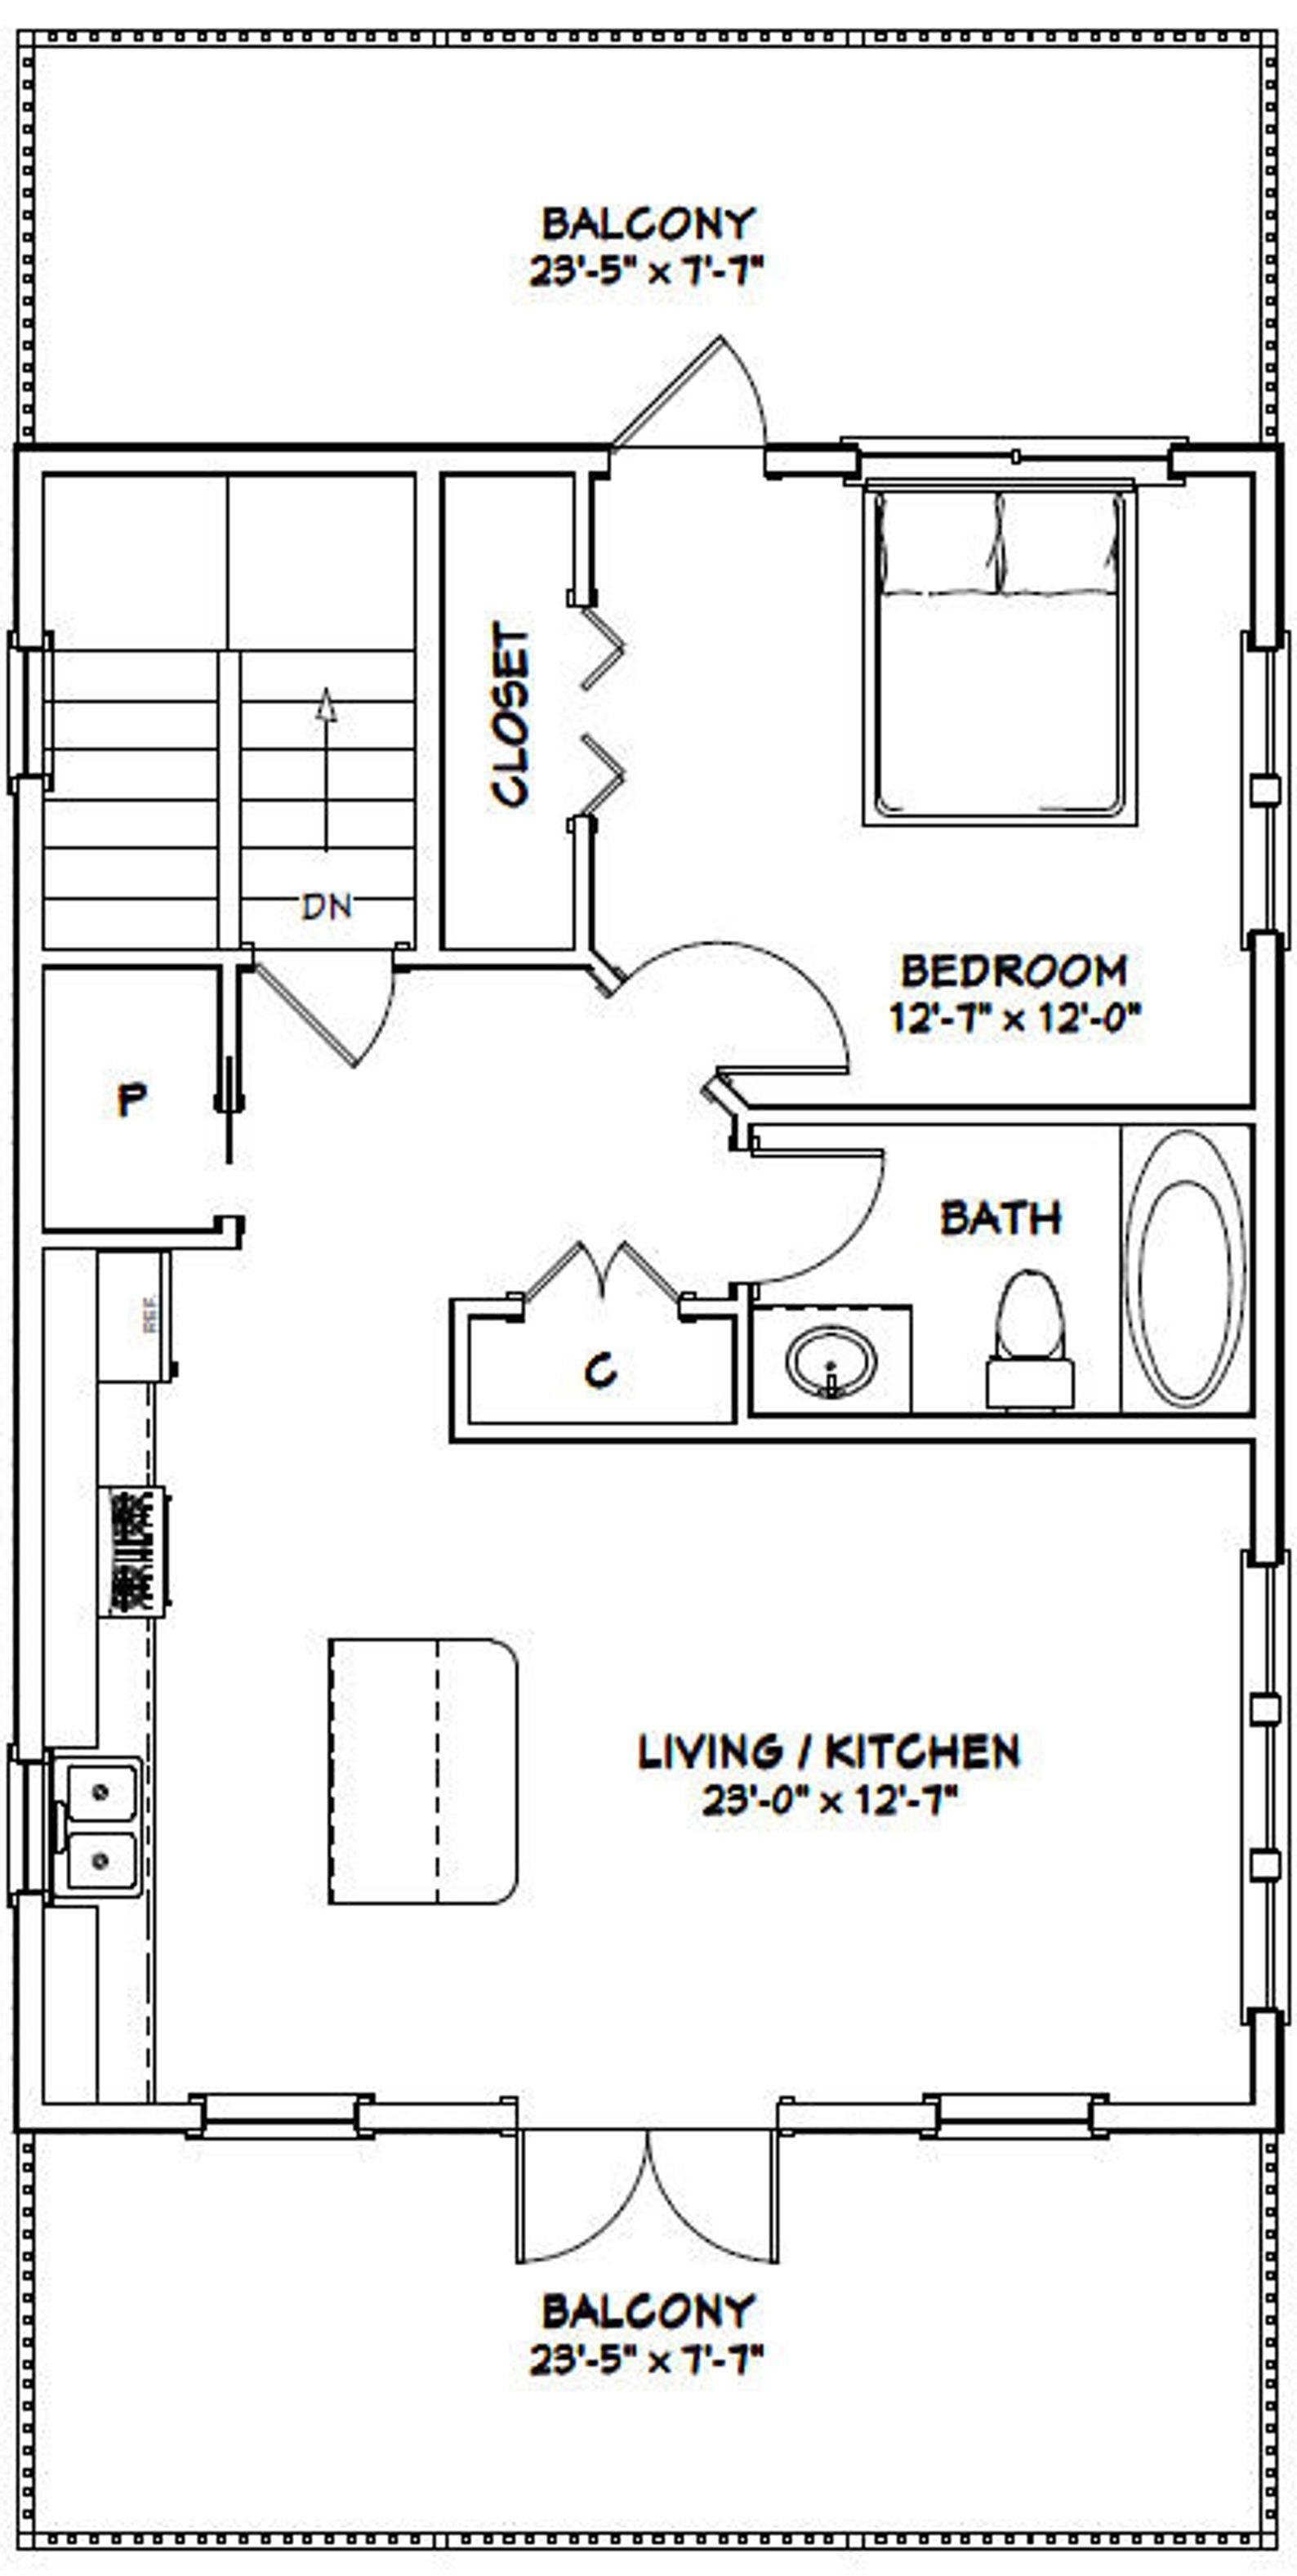 24x32 House 1 Bedroom 1.5 Bath 830 sq ft PDF Floor Etsy